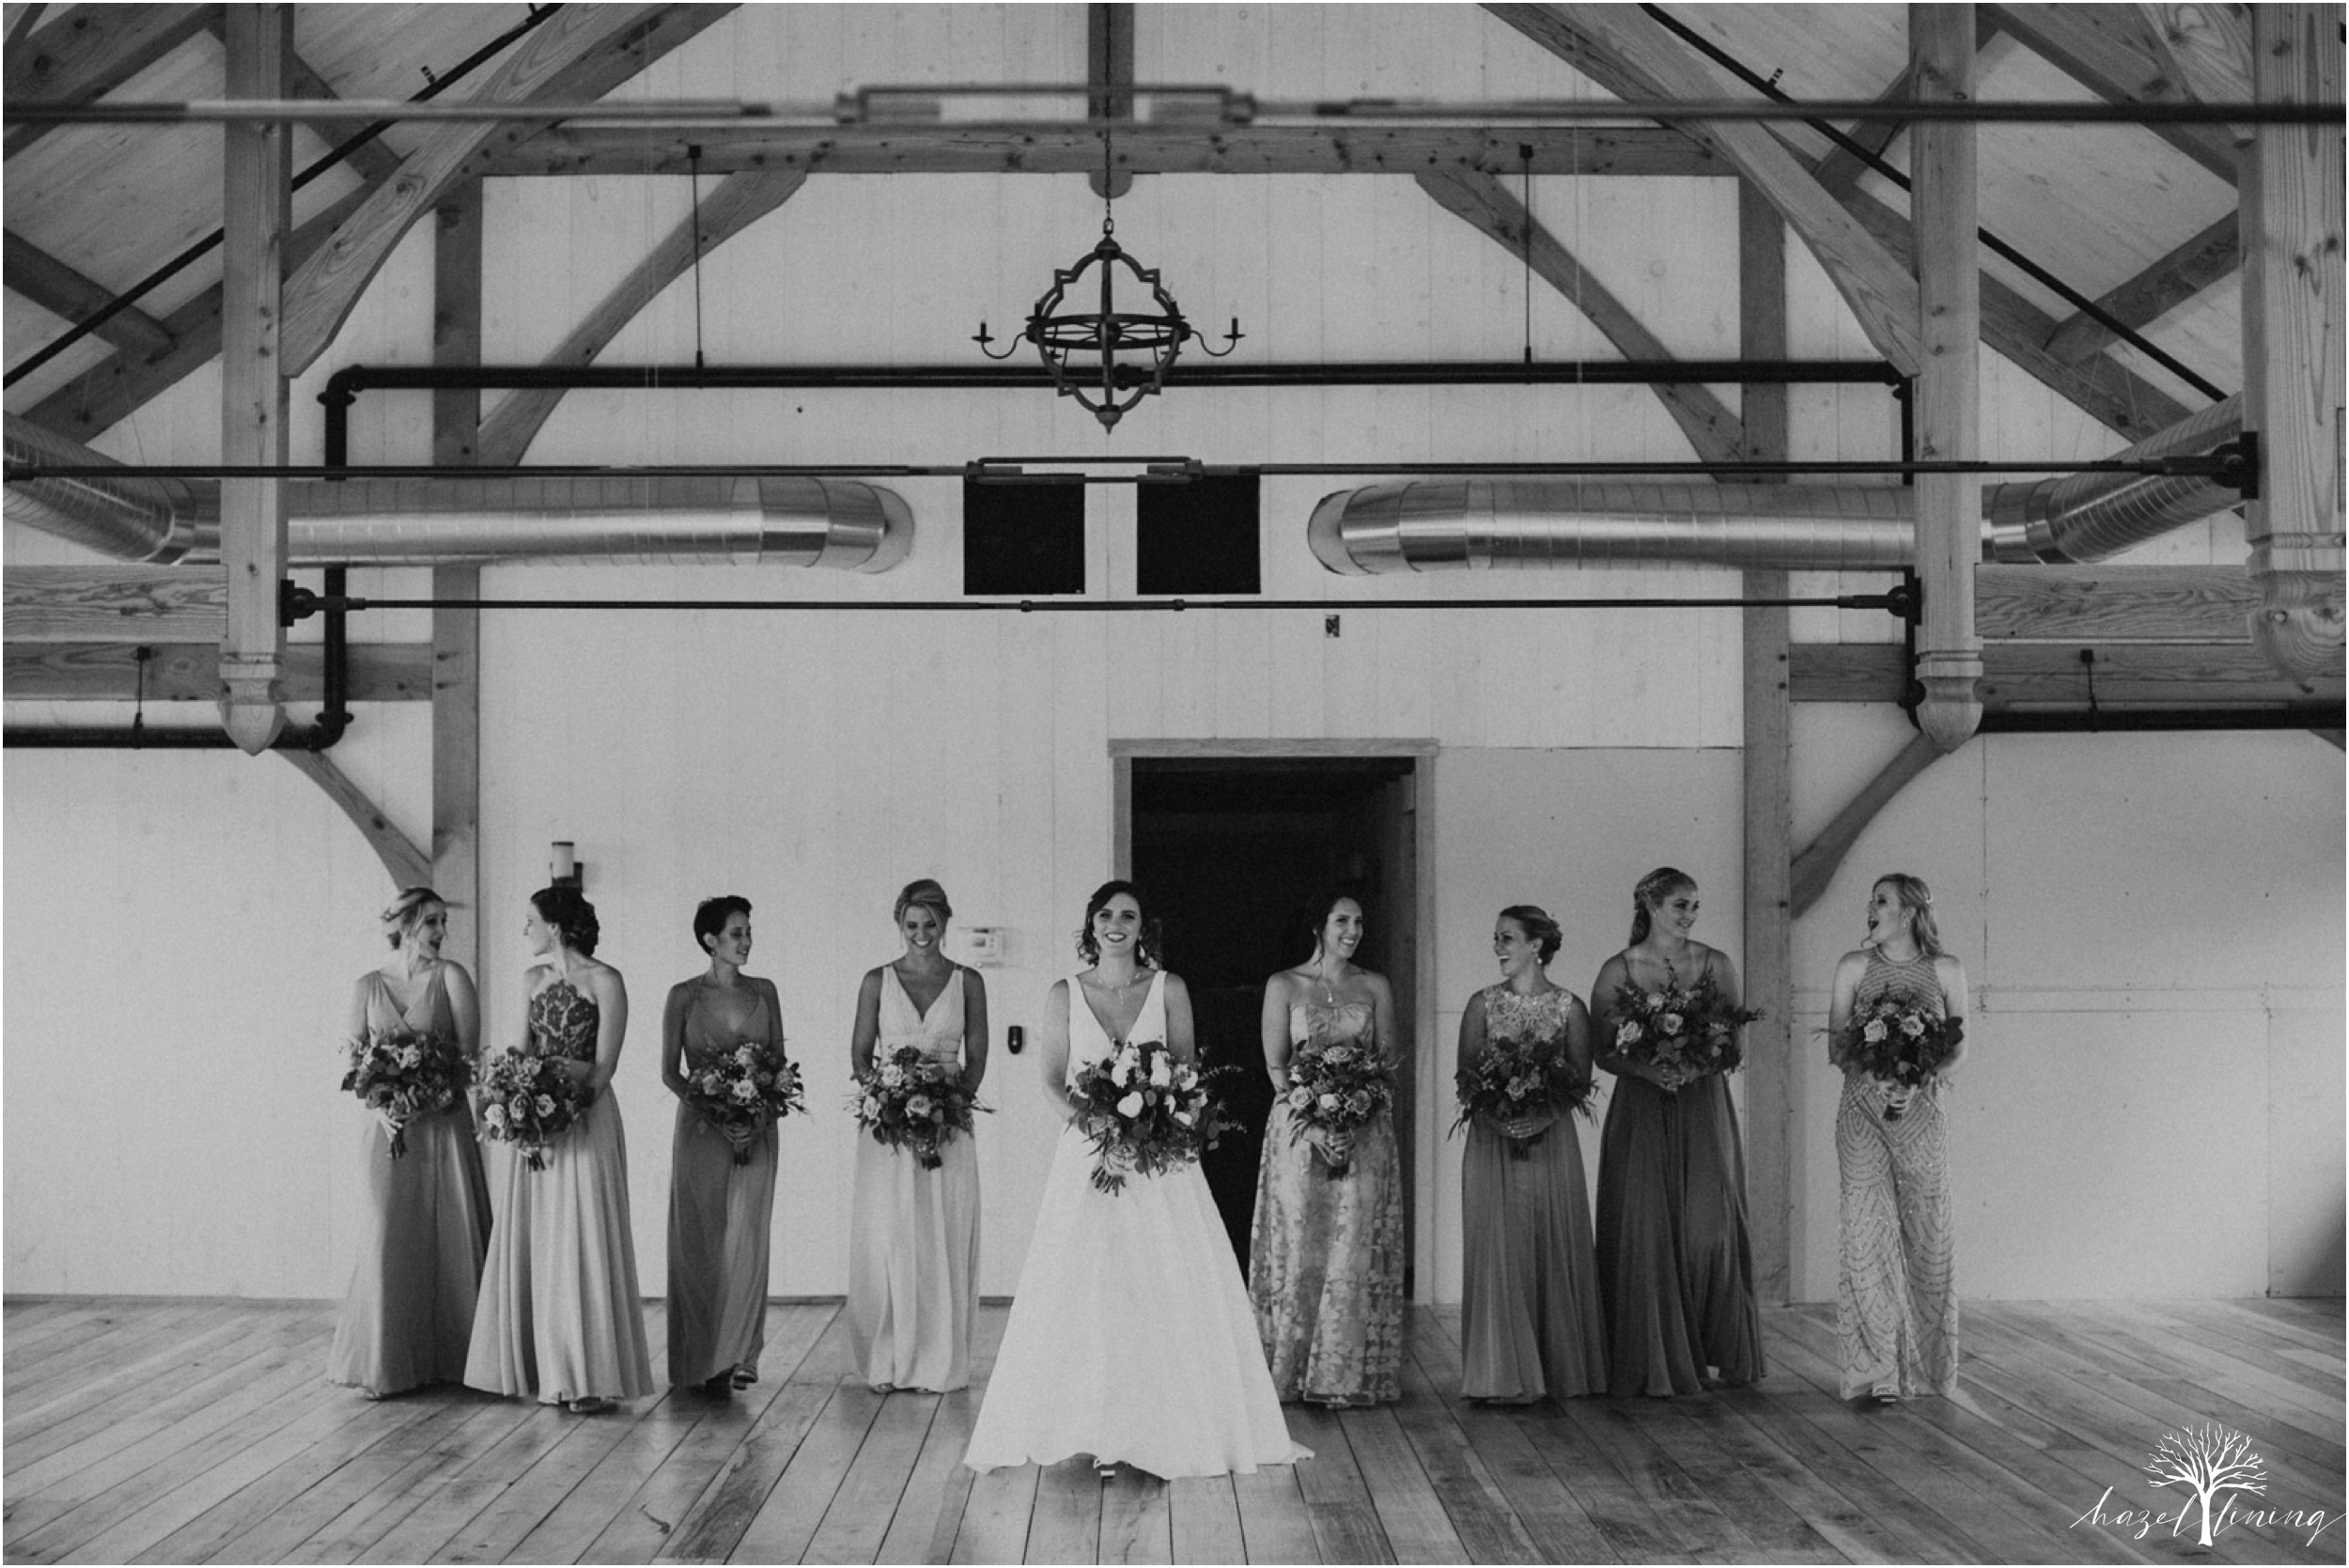 maureen-hepner-anthony-giordano-rose-bank-winery-newtow-pennsylvania-luxury-summer-wedding-hazel-lining-photography-destination-elopement-wedding-engagement-photography_0030.jpg